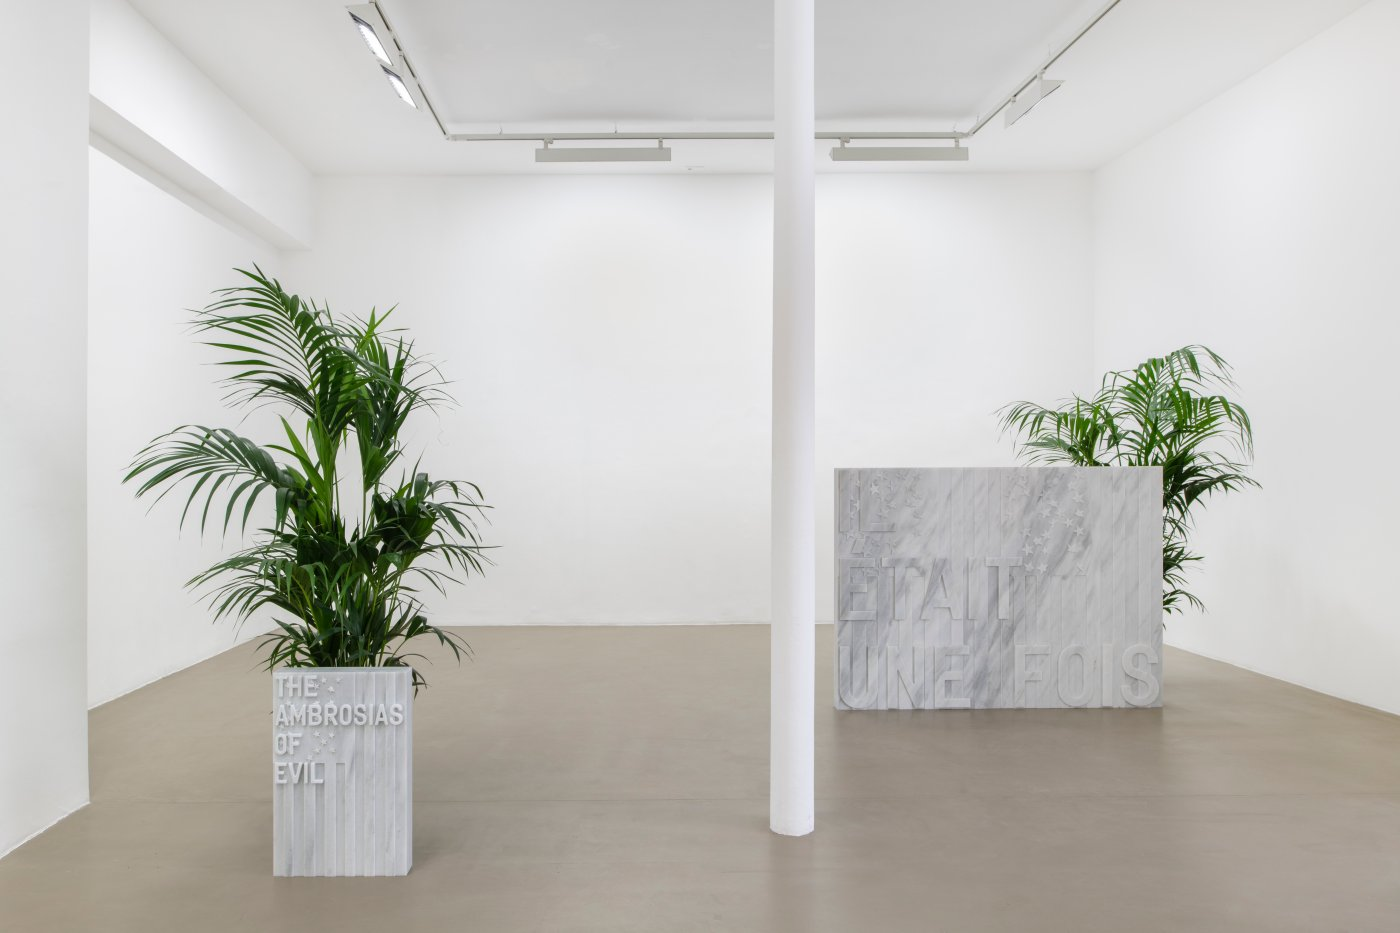 Galerie Chantal Crousel Rirkrit Tiravanija 2